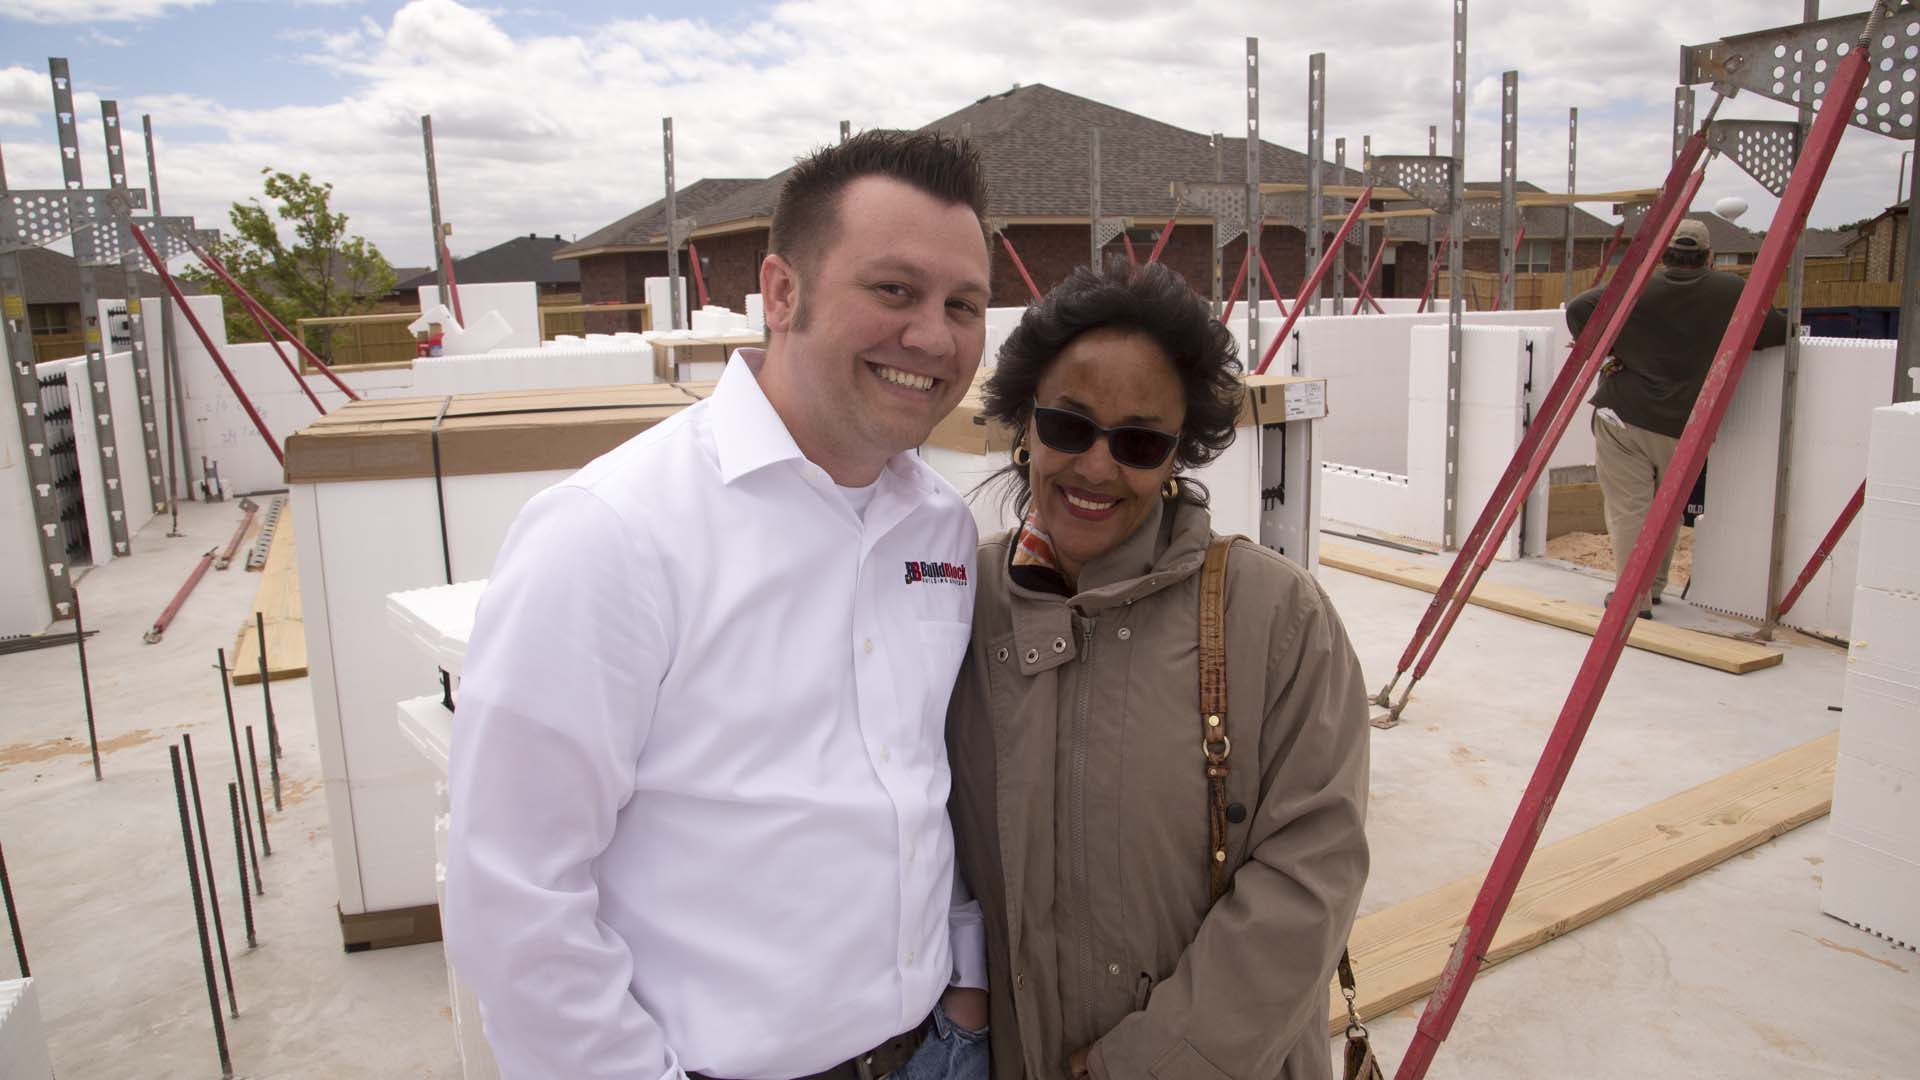 Moore Family Rebuilds Tornado Resistant Home